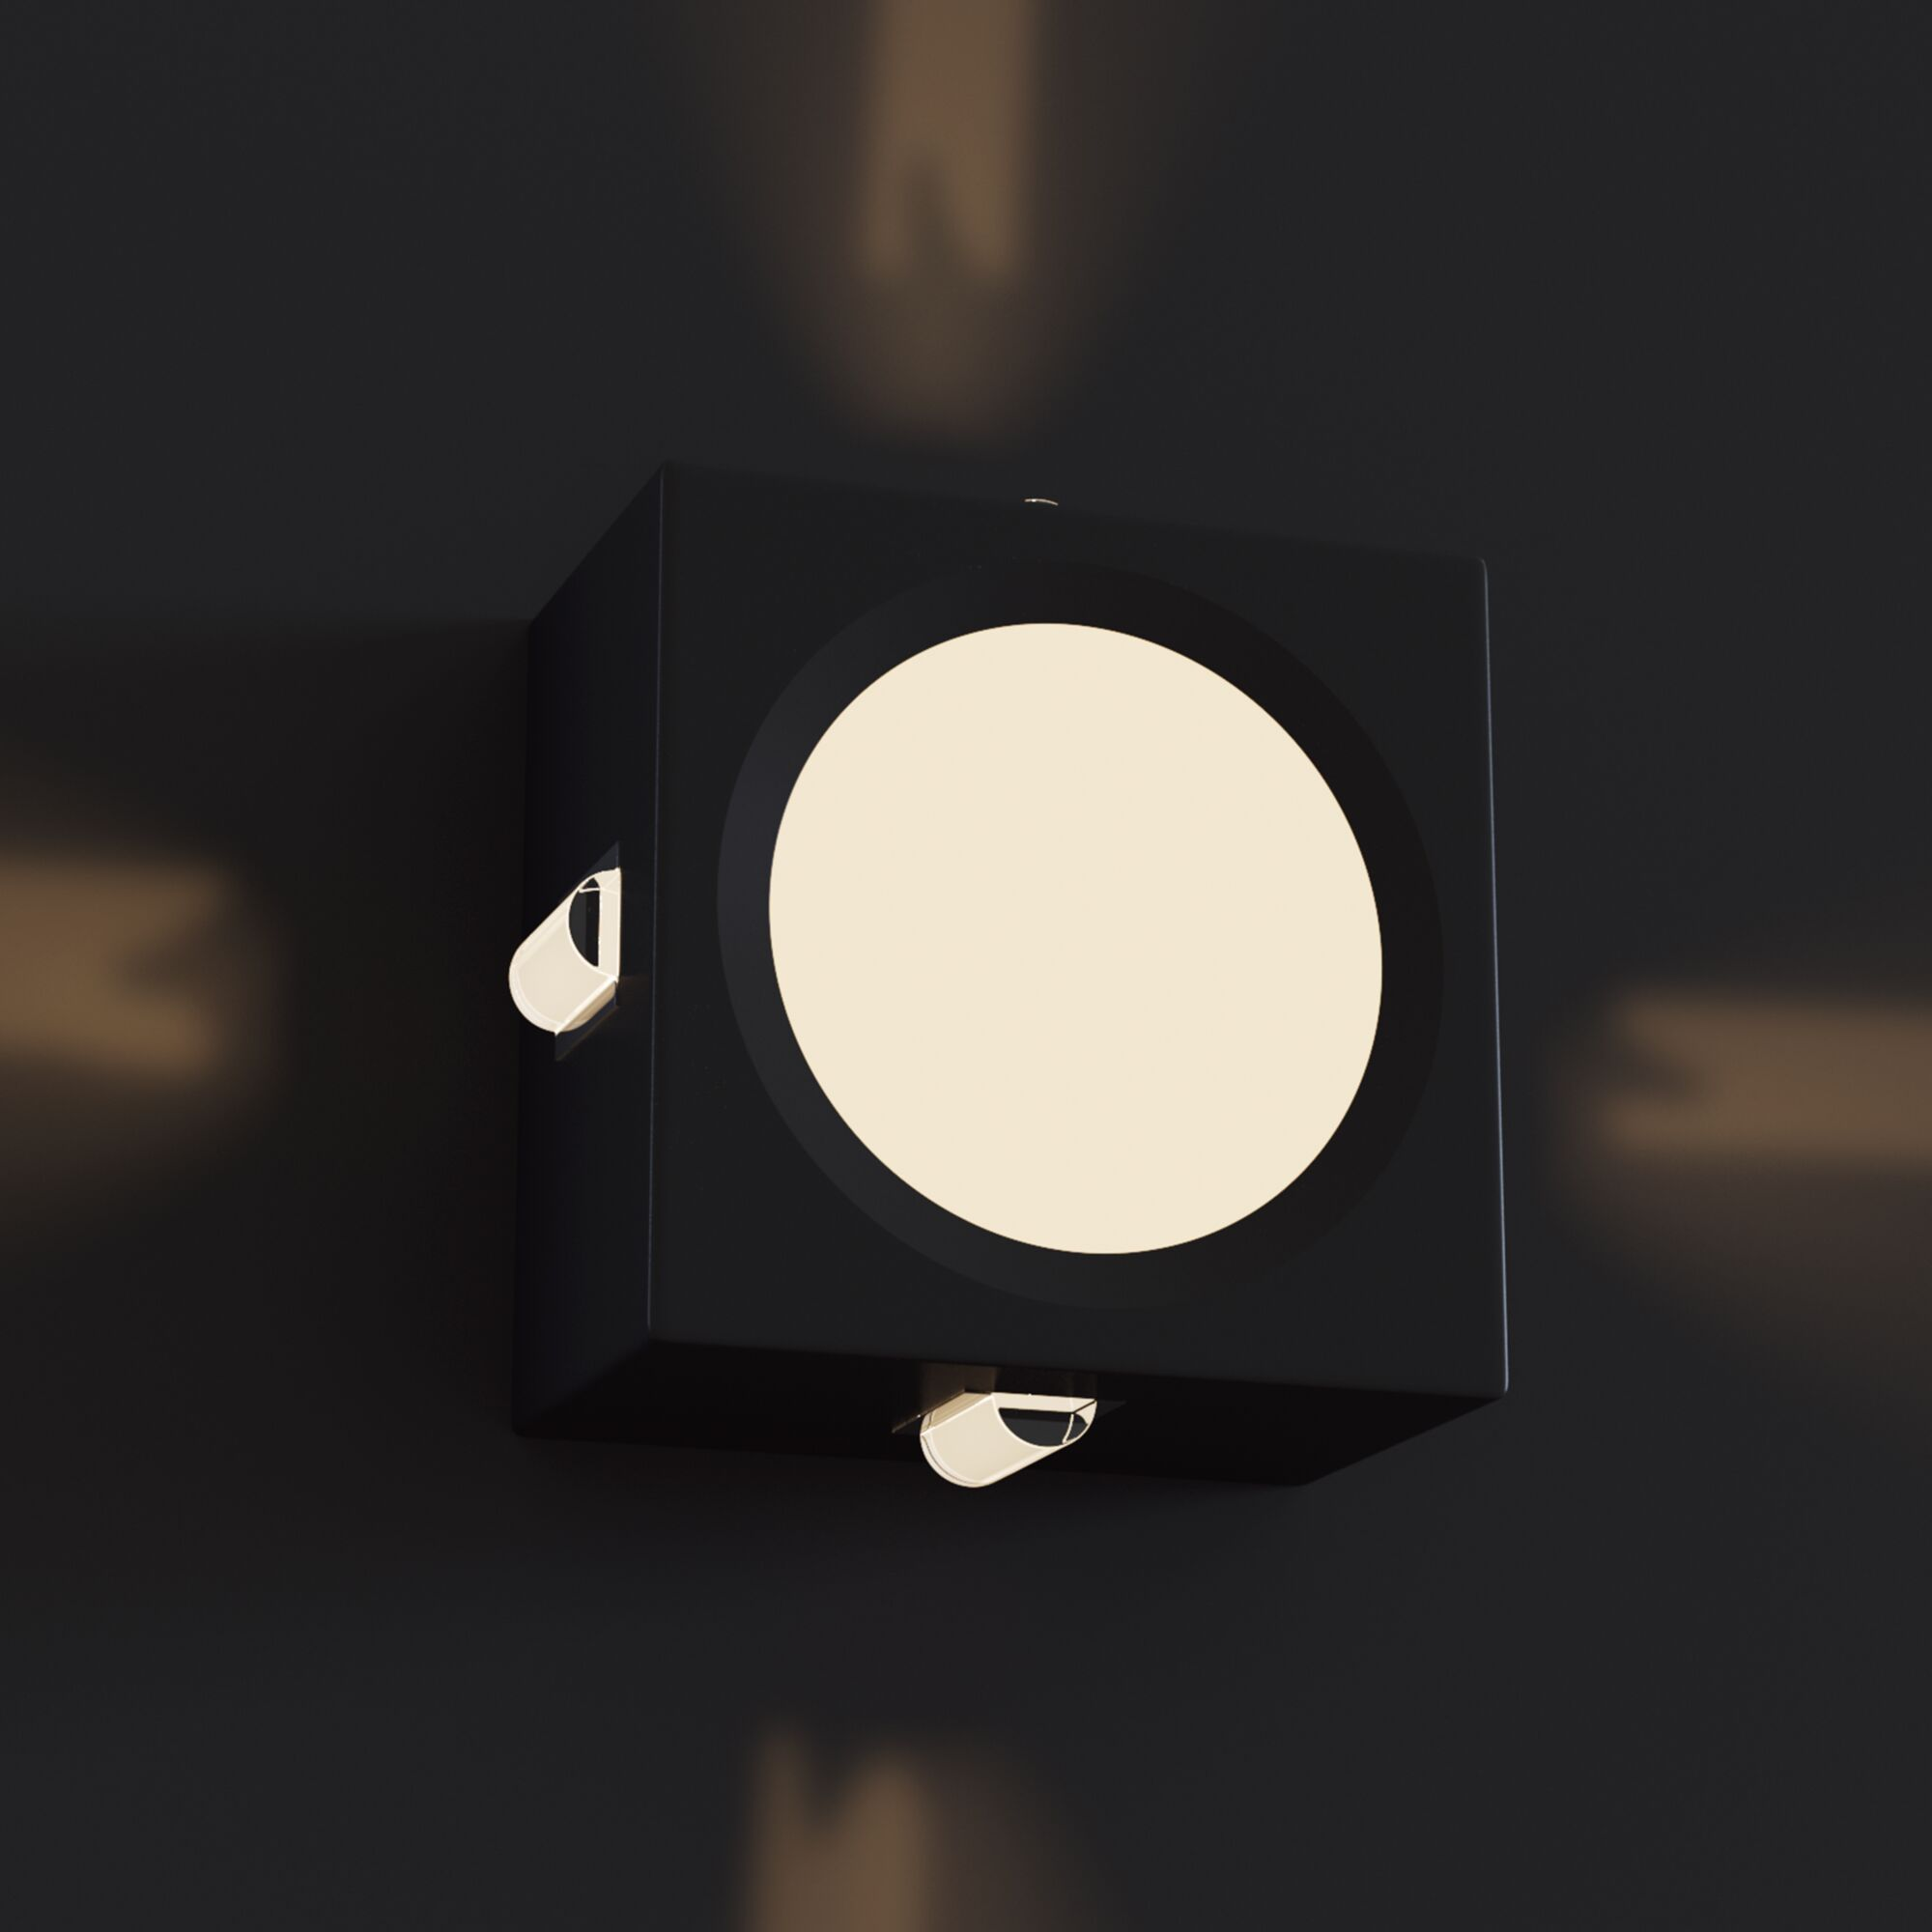 Настенный светильник Maytoni O012WL L10B